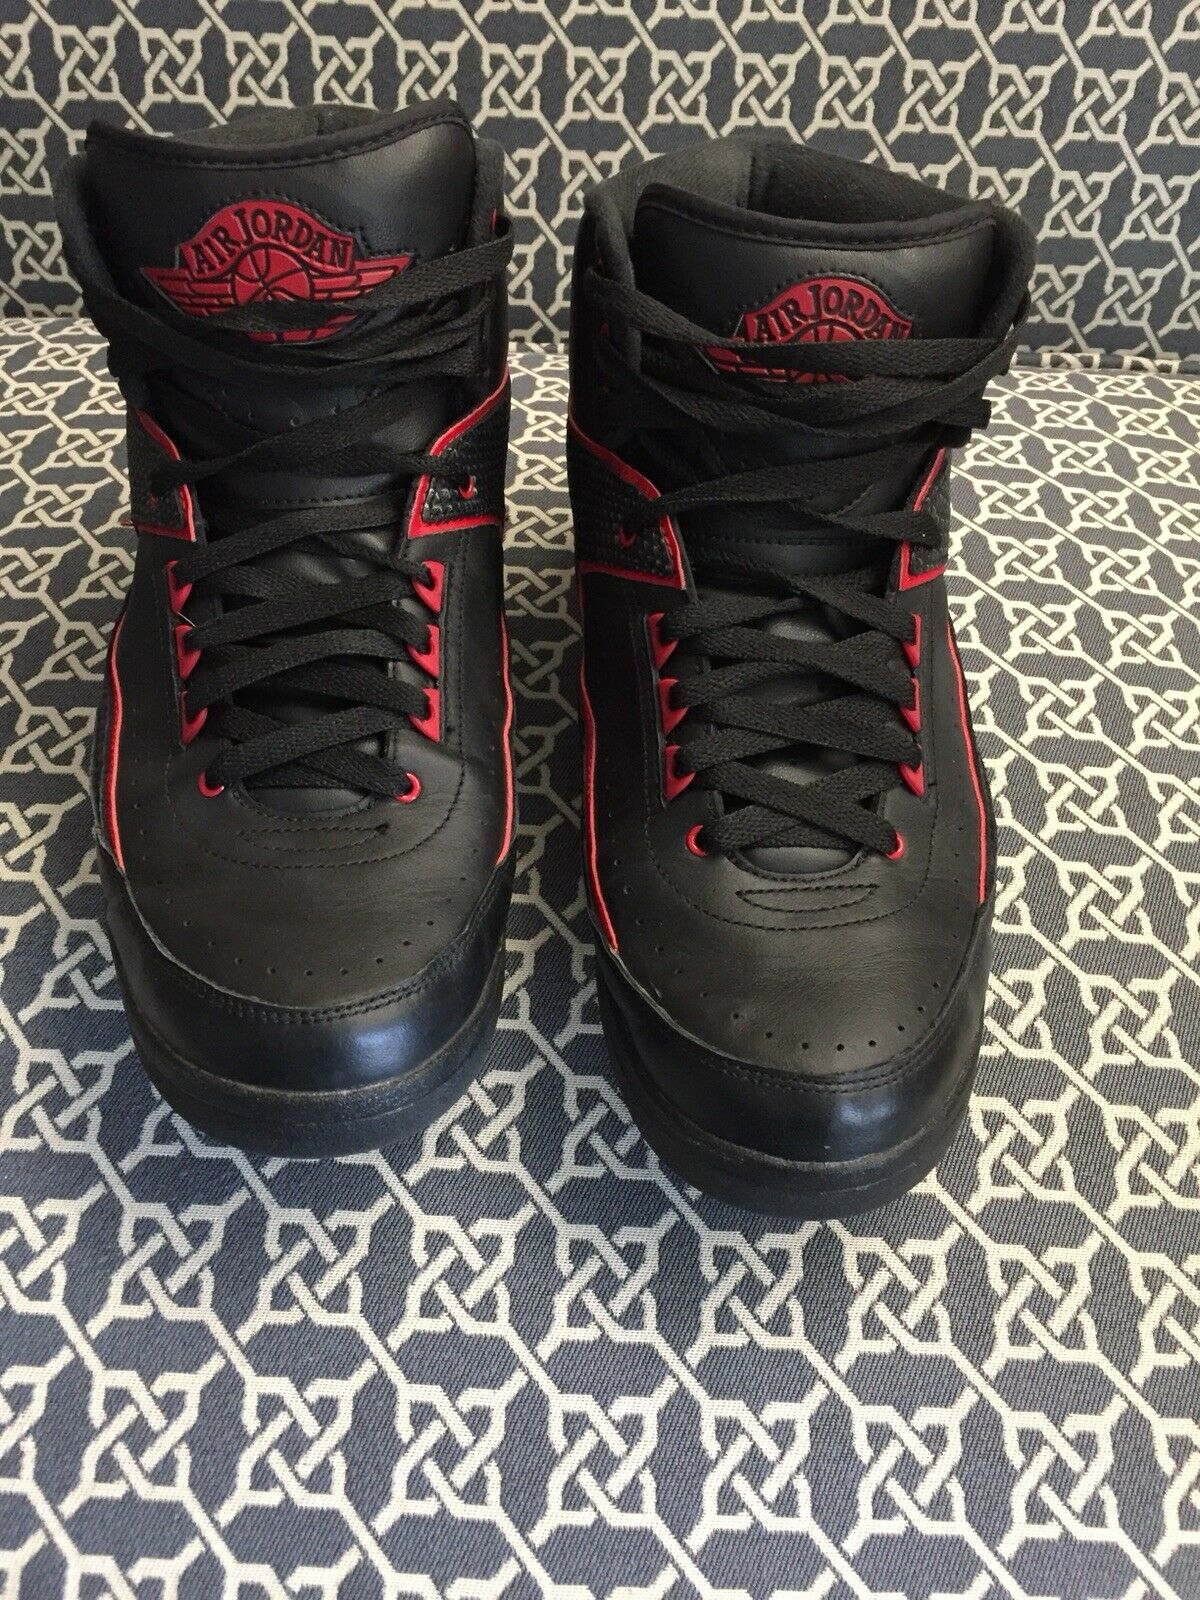 Jordan 2 Retro black Red size 12